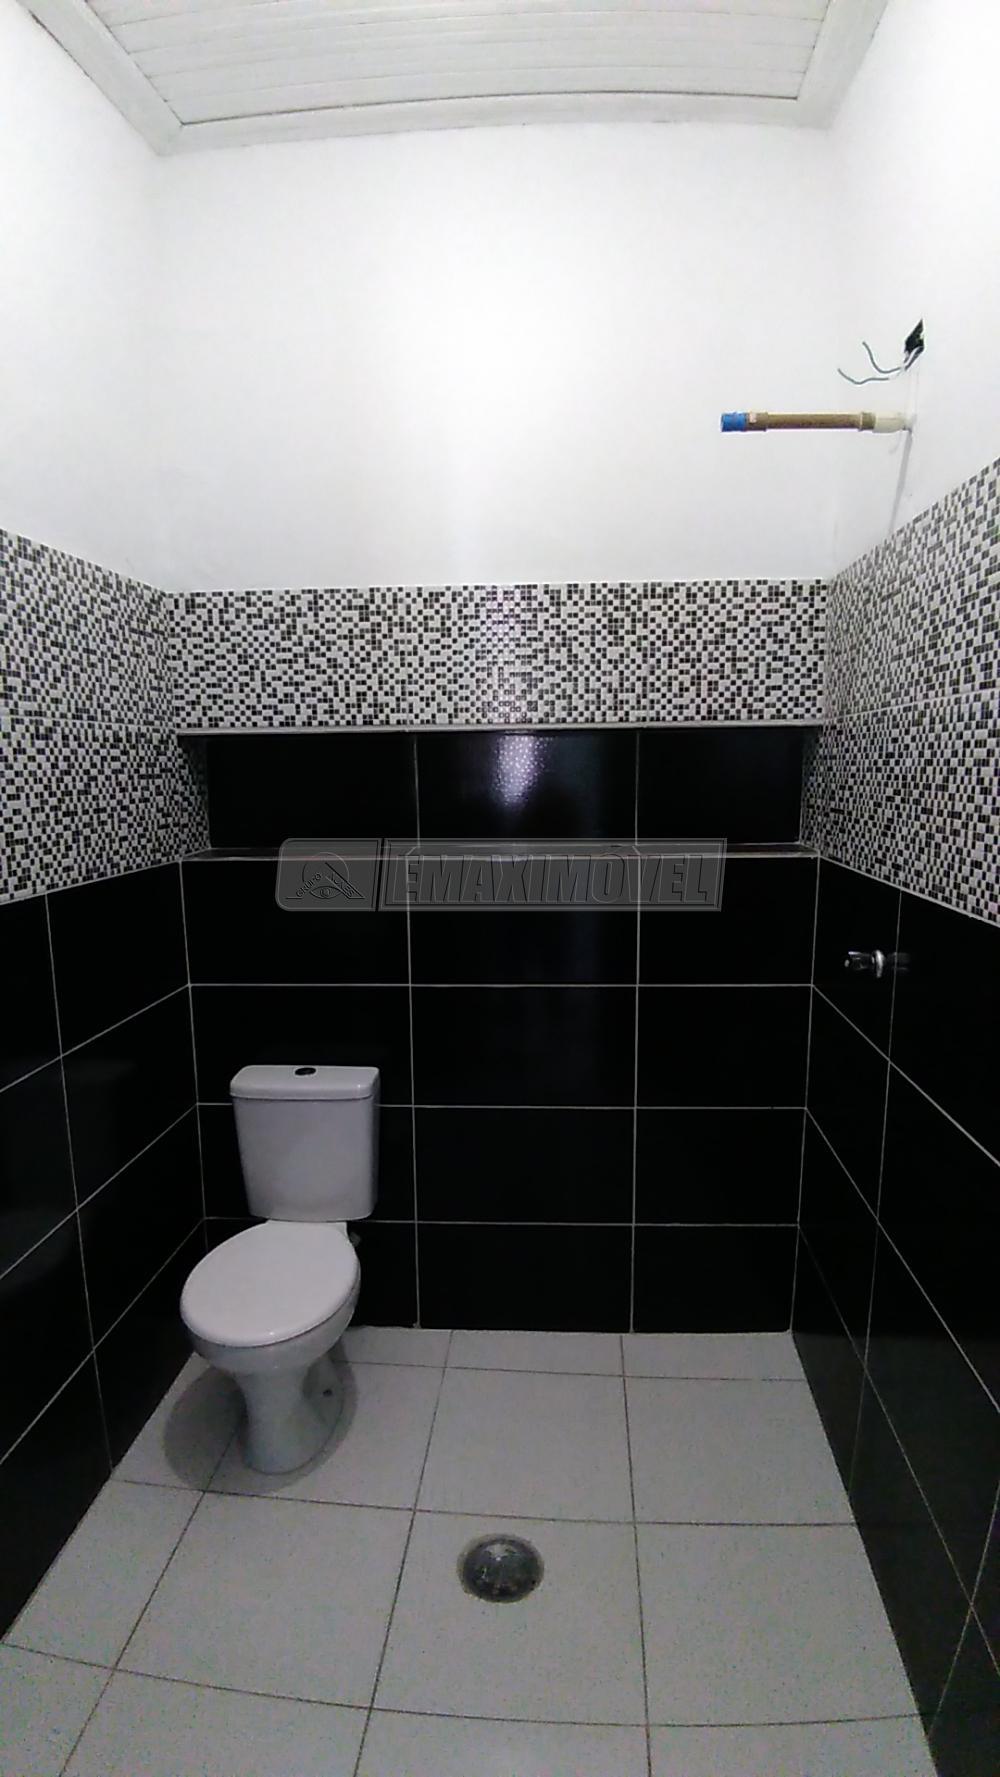 Alugar Apartamentos / Kitnet em Sorocaba R$ 580,00 - Foto 6